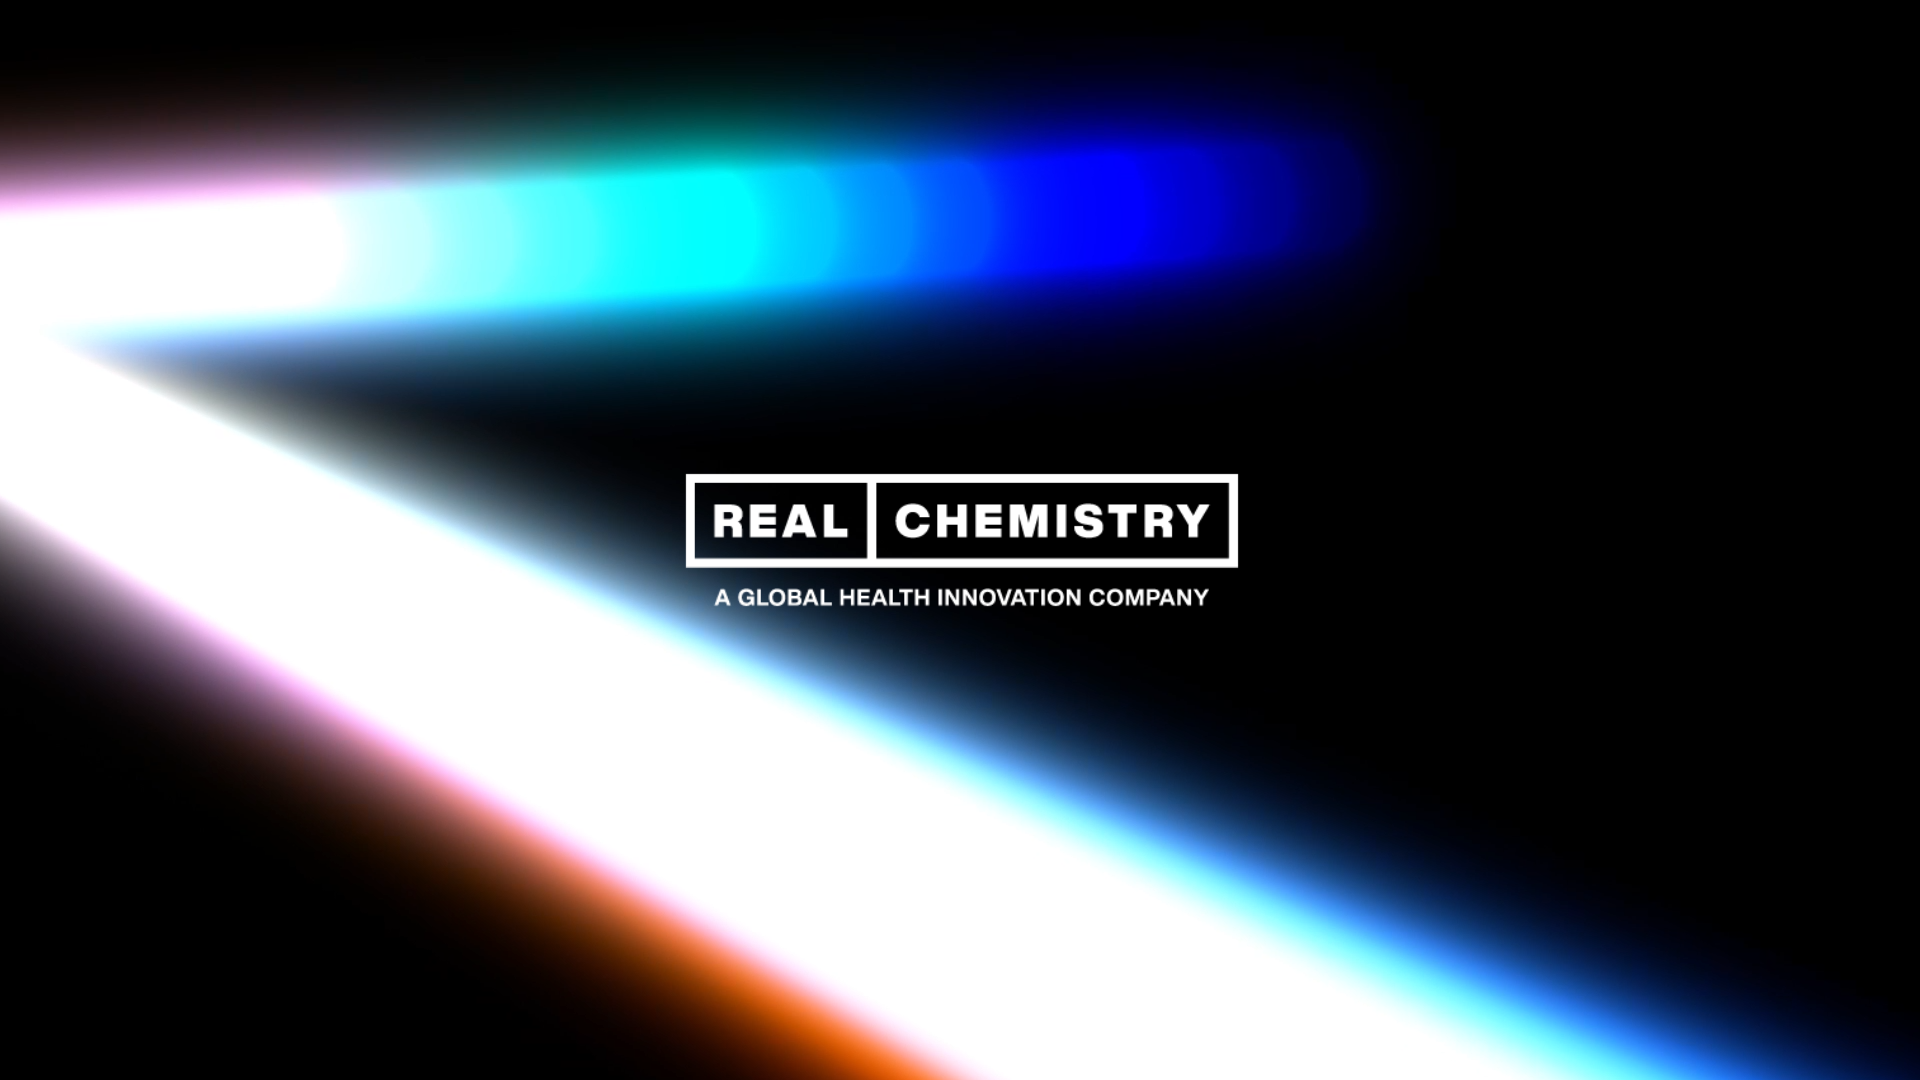 RealChem_Blog_Cover03-1